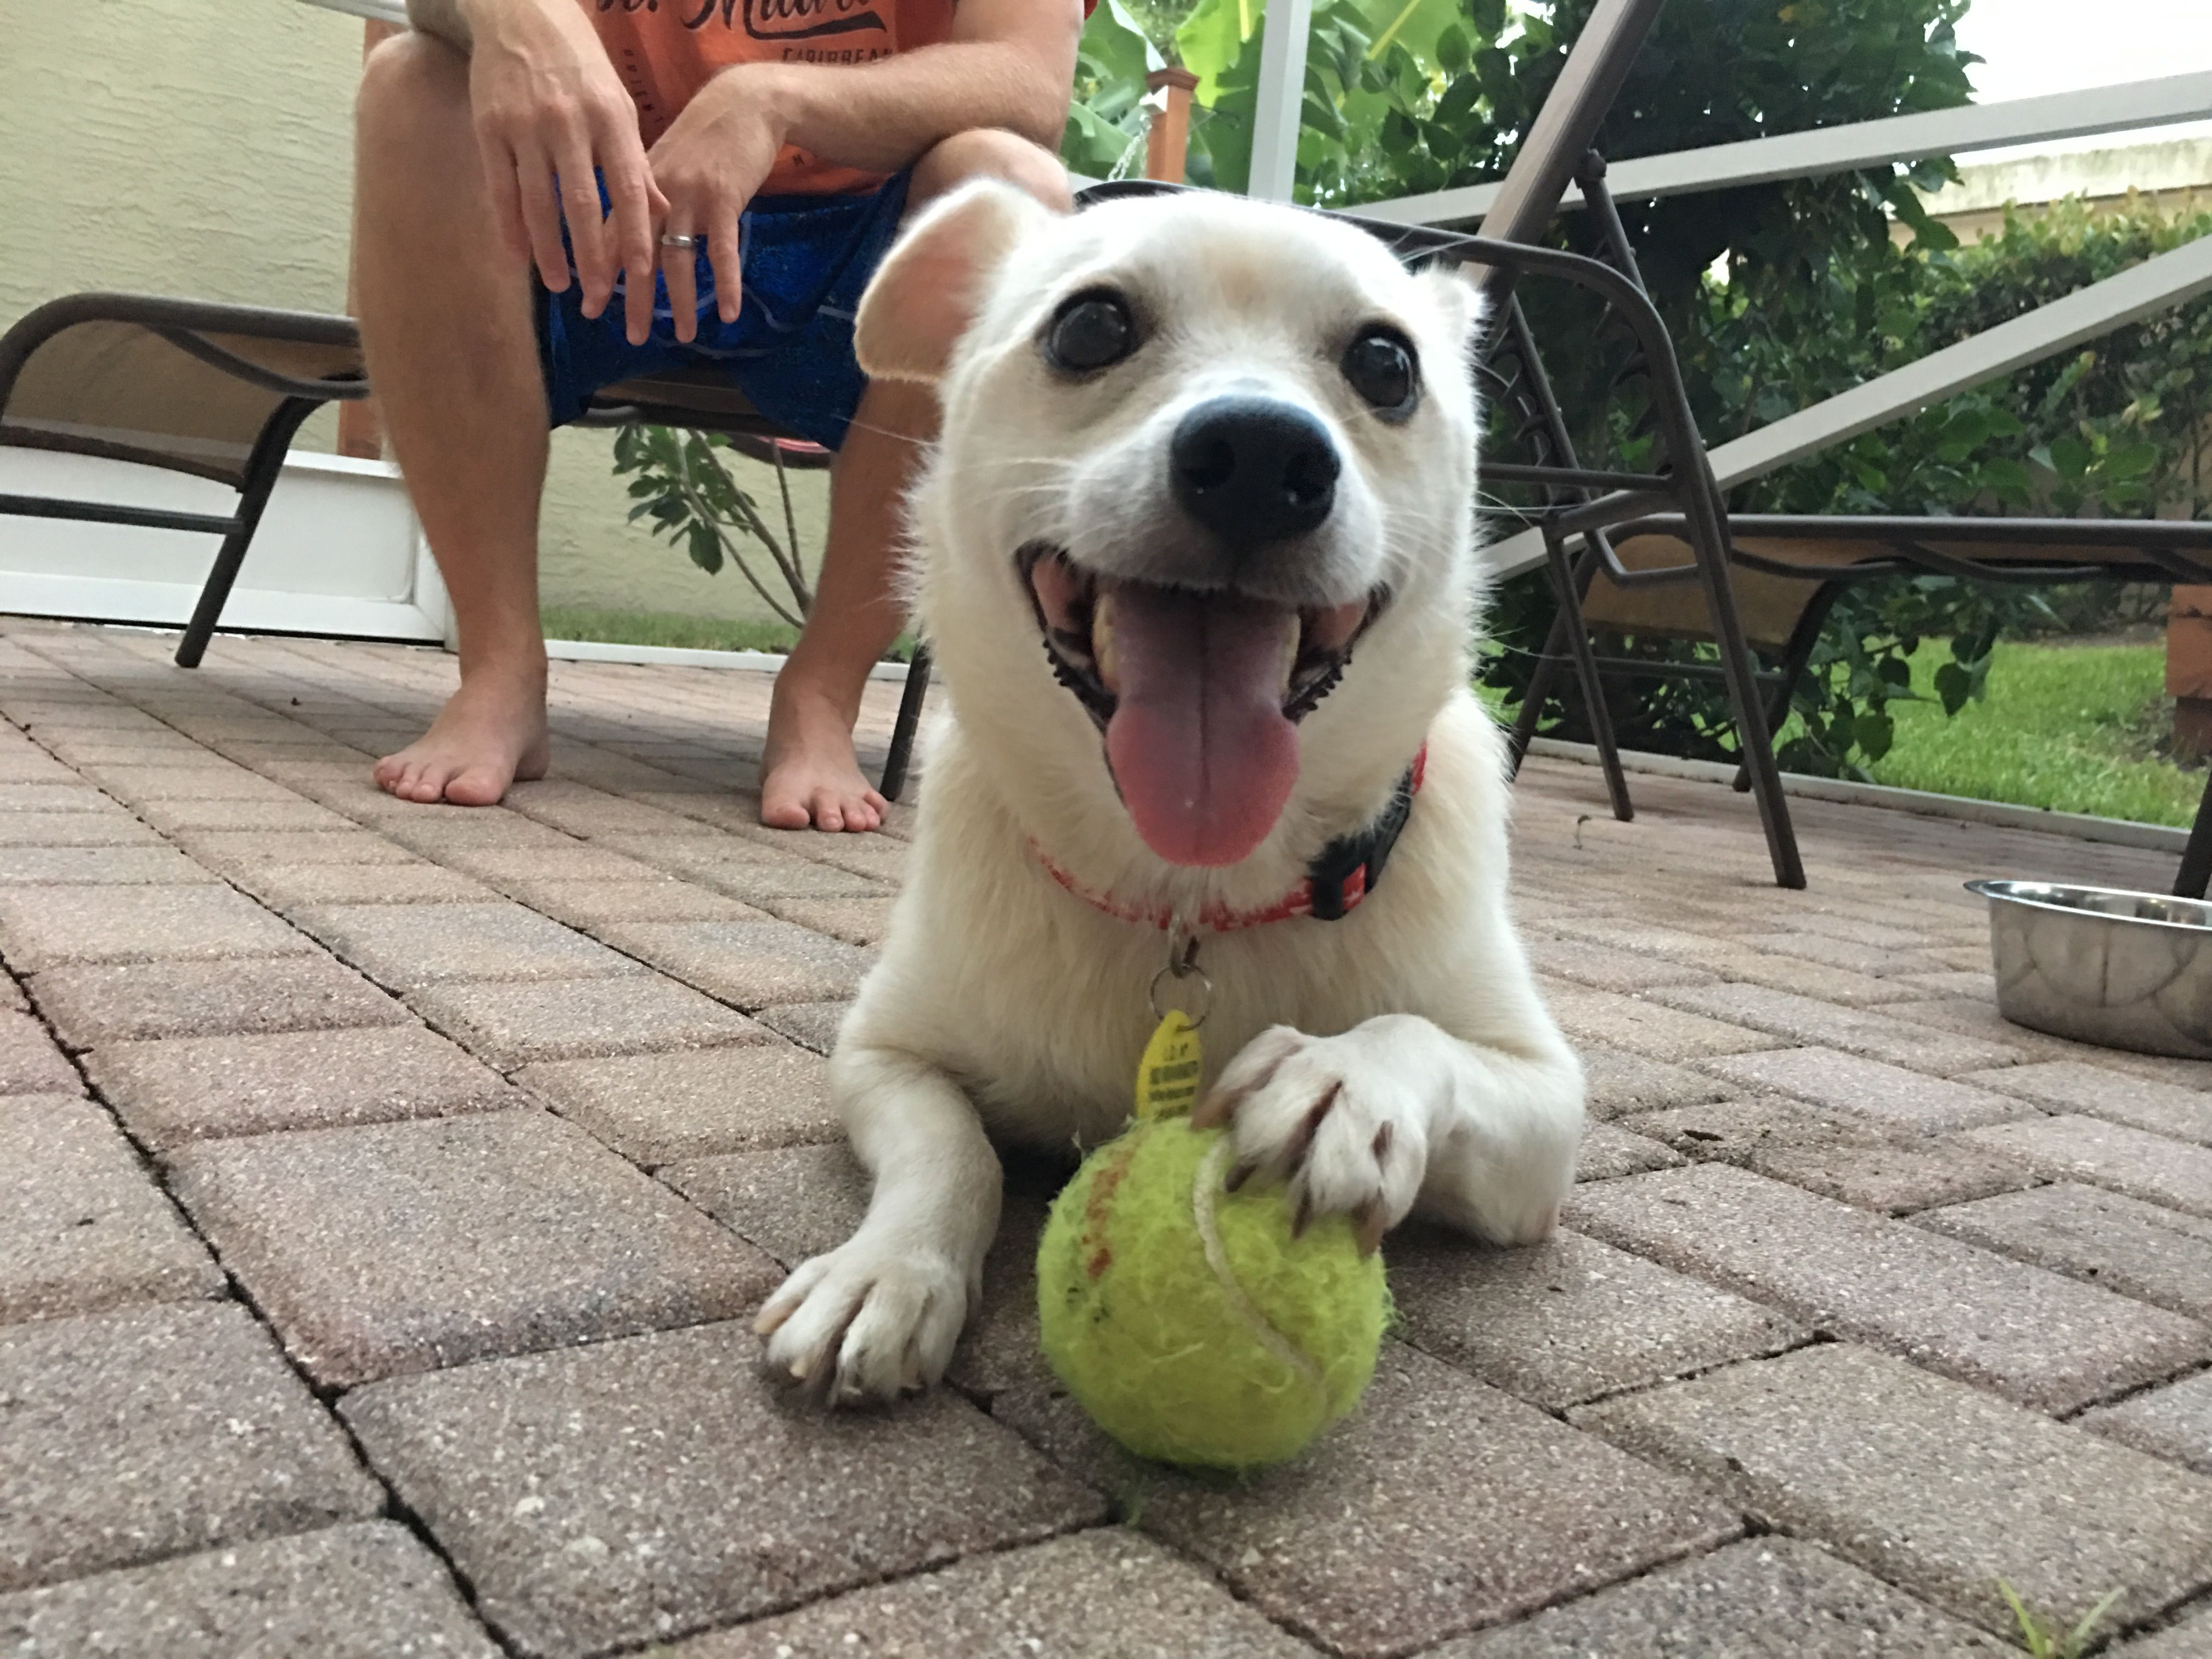 Chihuahua dog for Adoption in Royal Palm Beach, FL. ADN